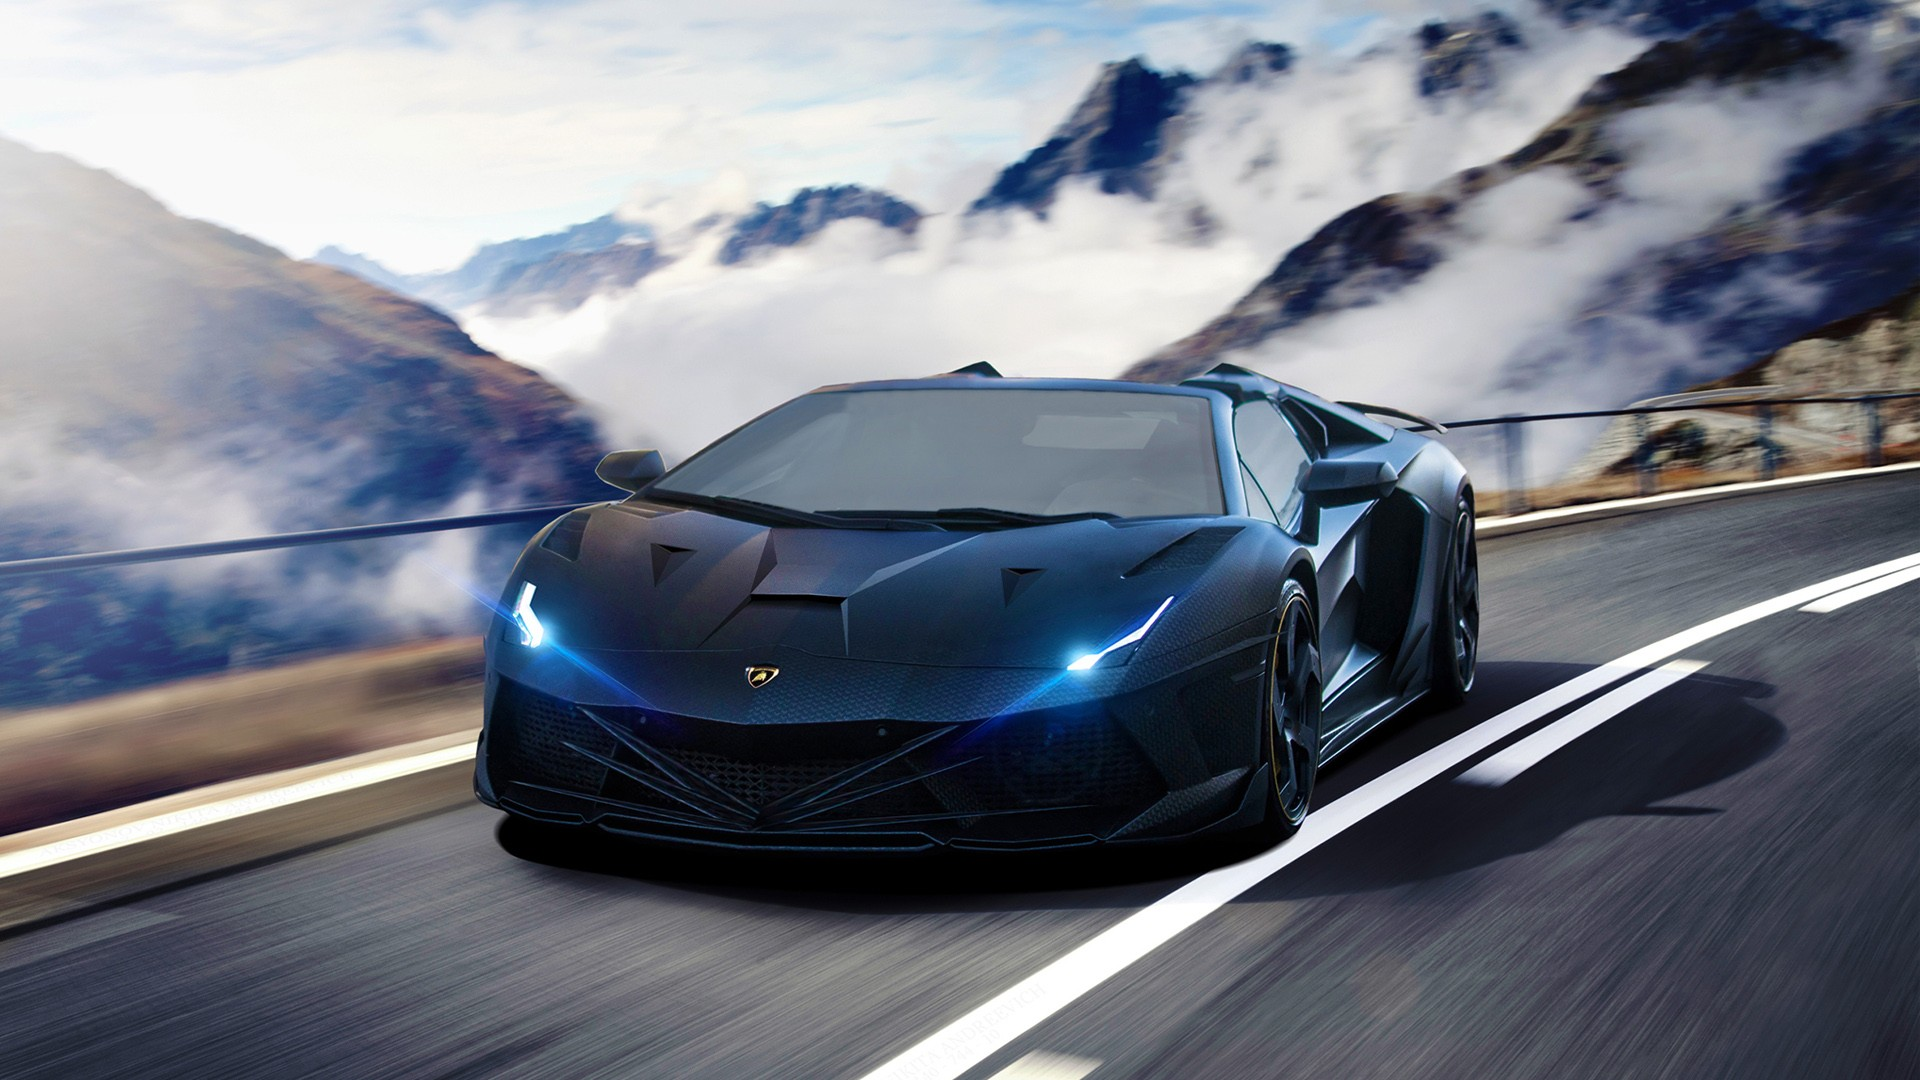 Car Wallpapers Hd 2015 Download Lamborghini Aventador Supercar Wallpaper Hd Car